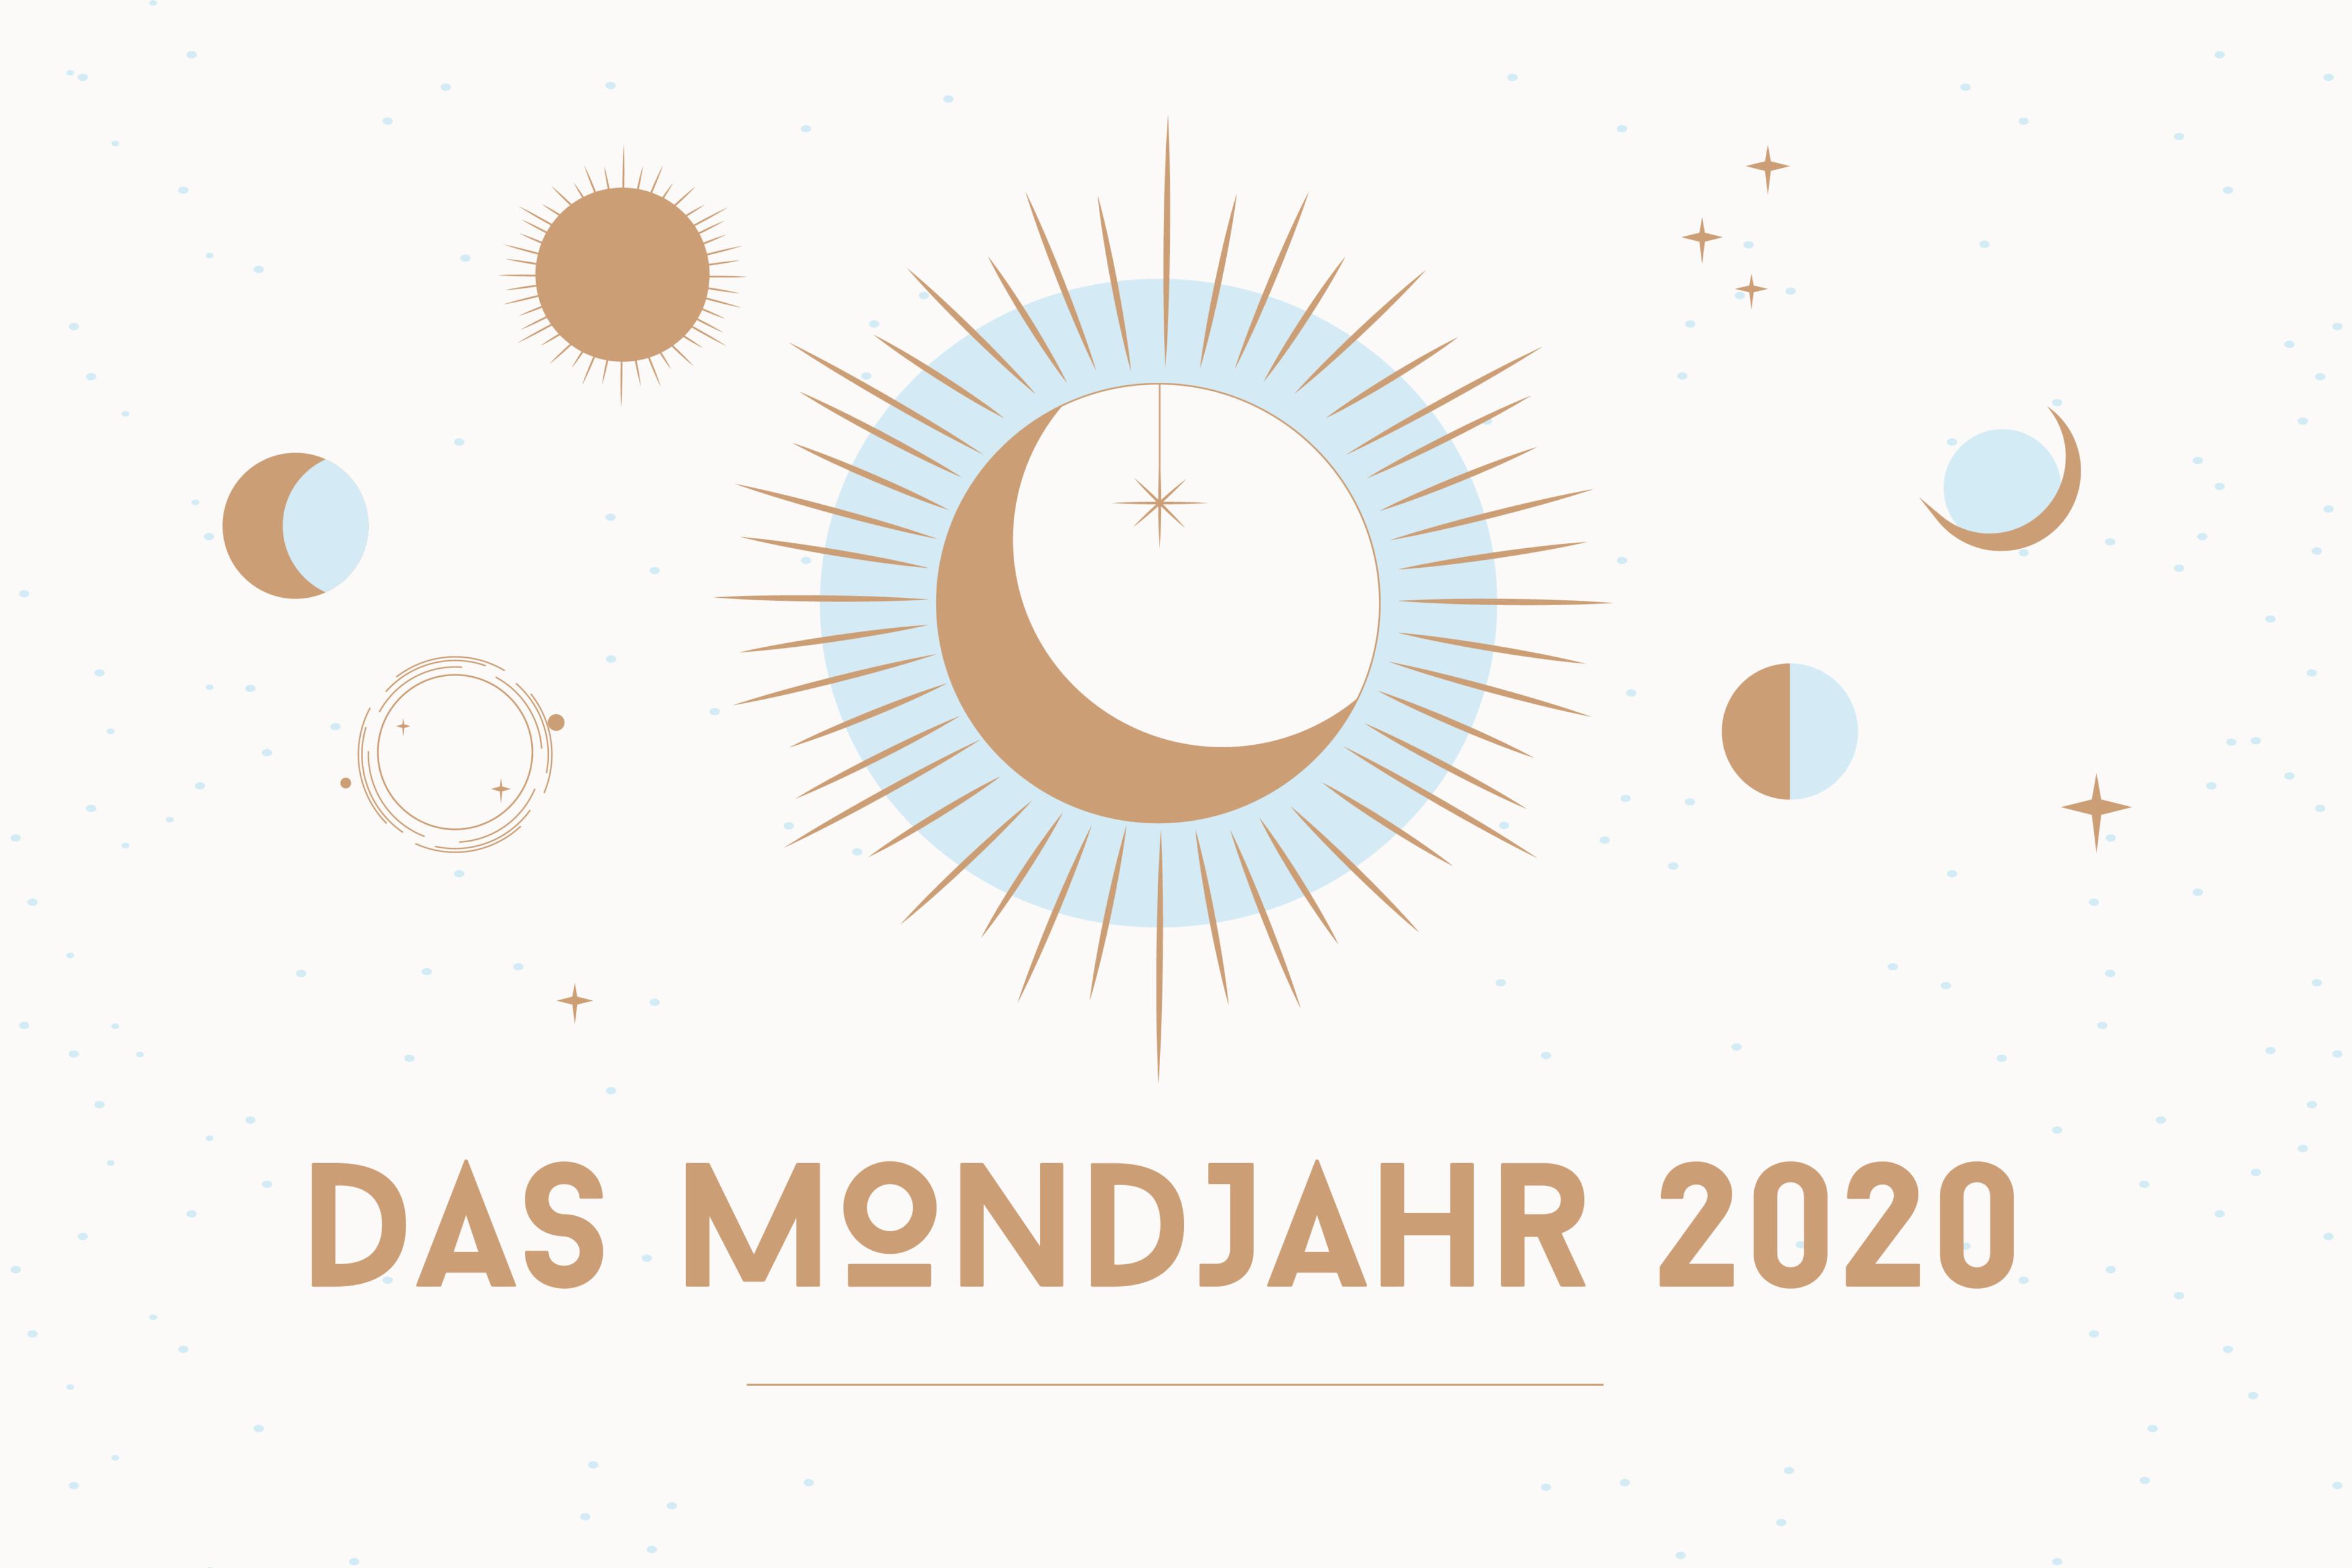 vollmond im januar 2020